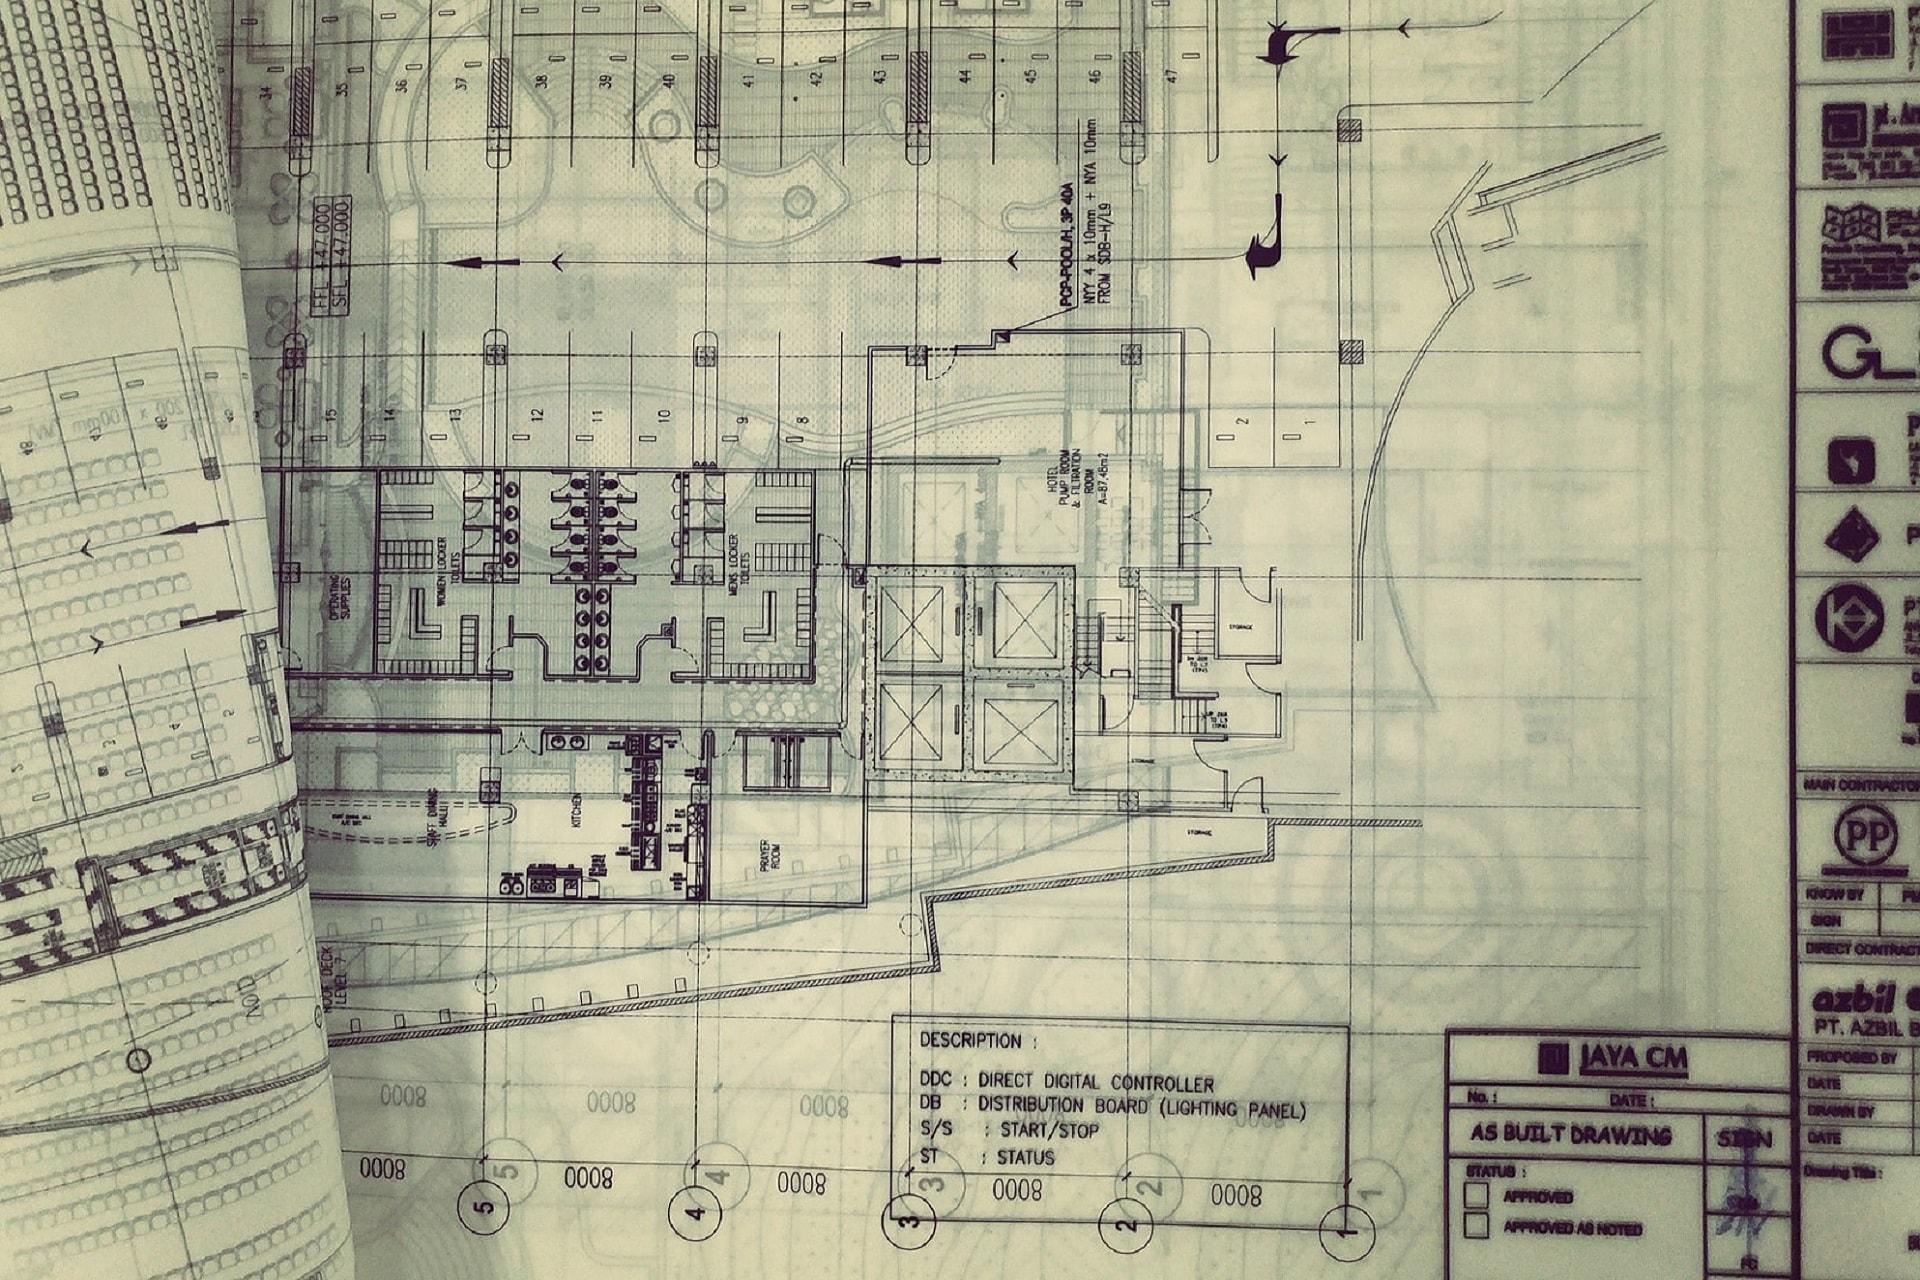 construction-2682641_1920-min-min